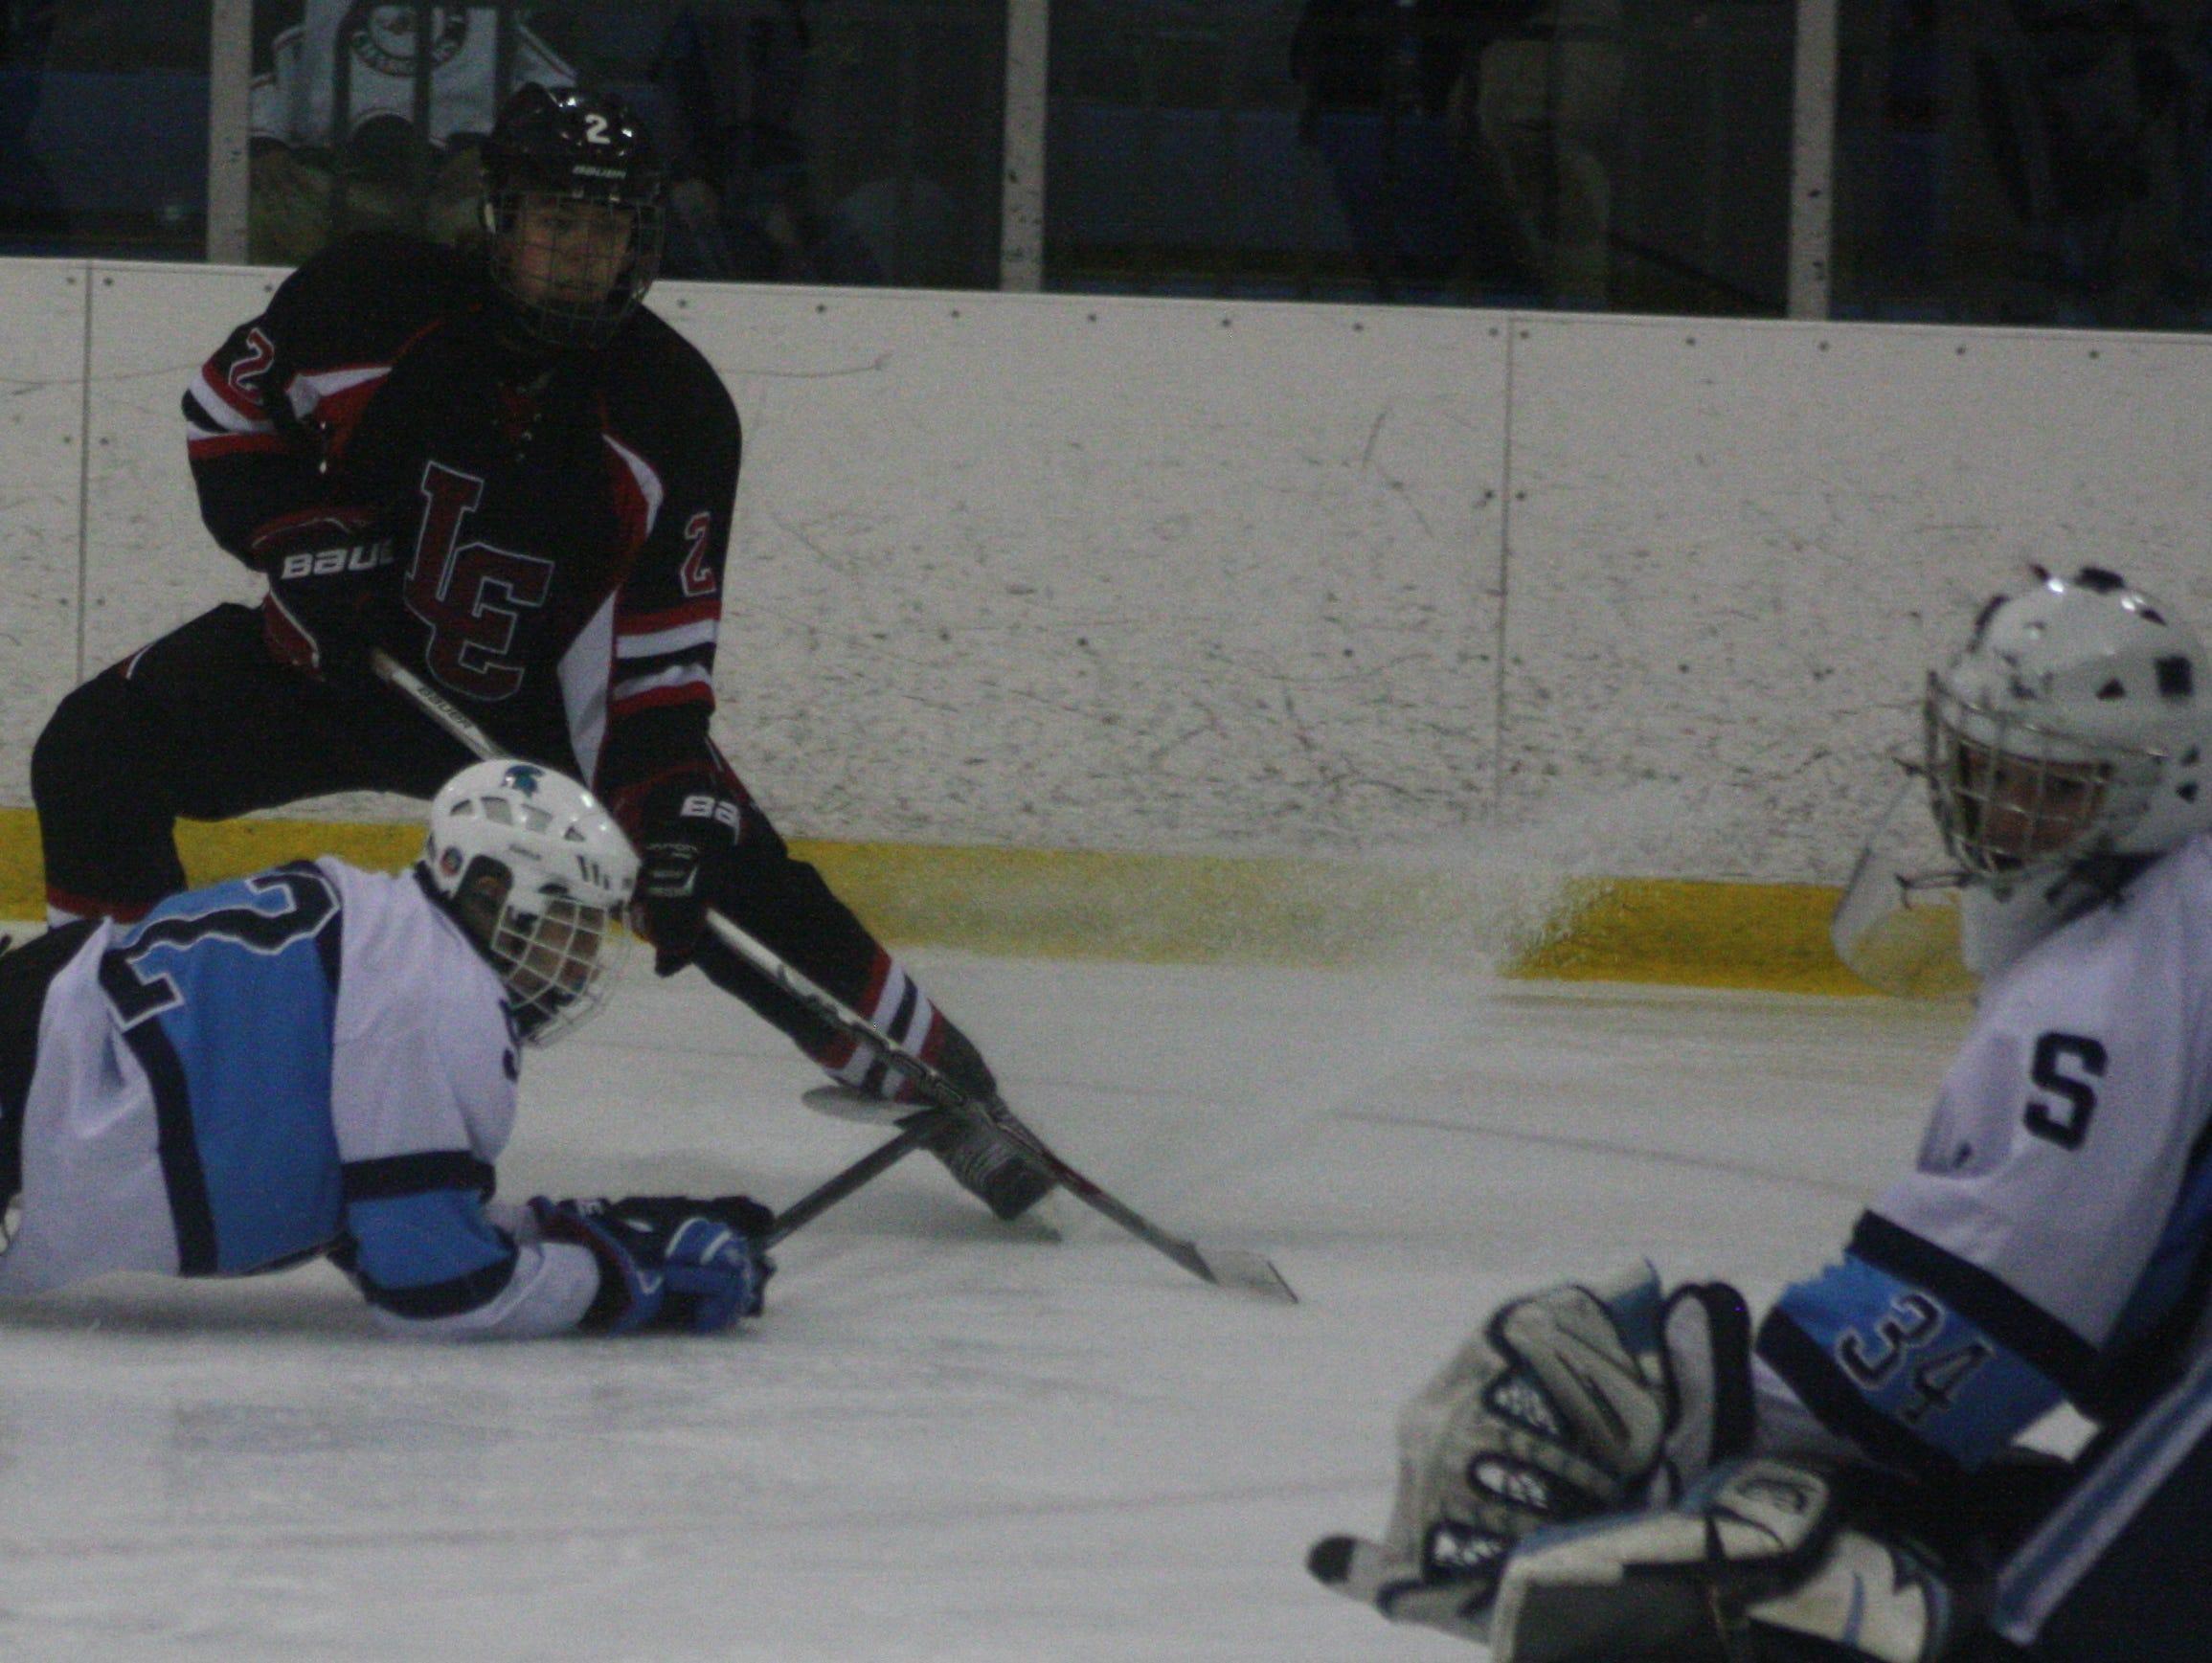 Stevenson goalie Cullen Barber made a glove save on a hard slap shot from Churchill's Josh Friend.